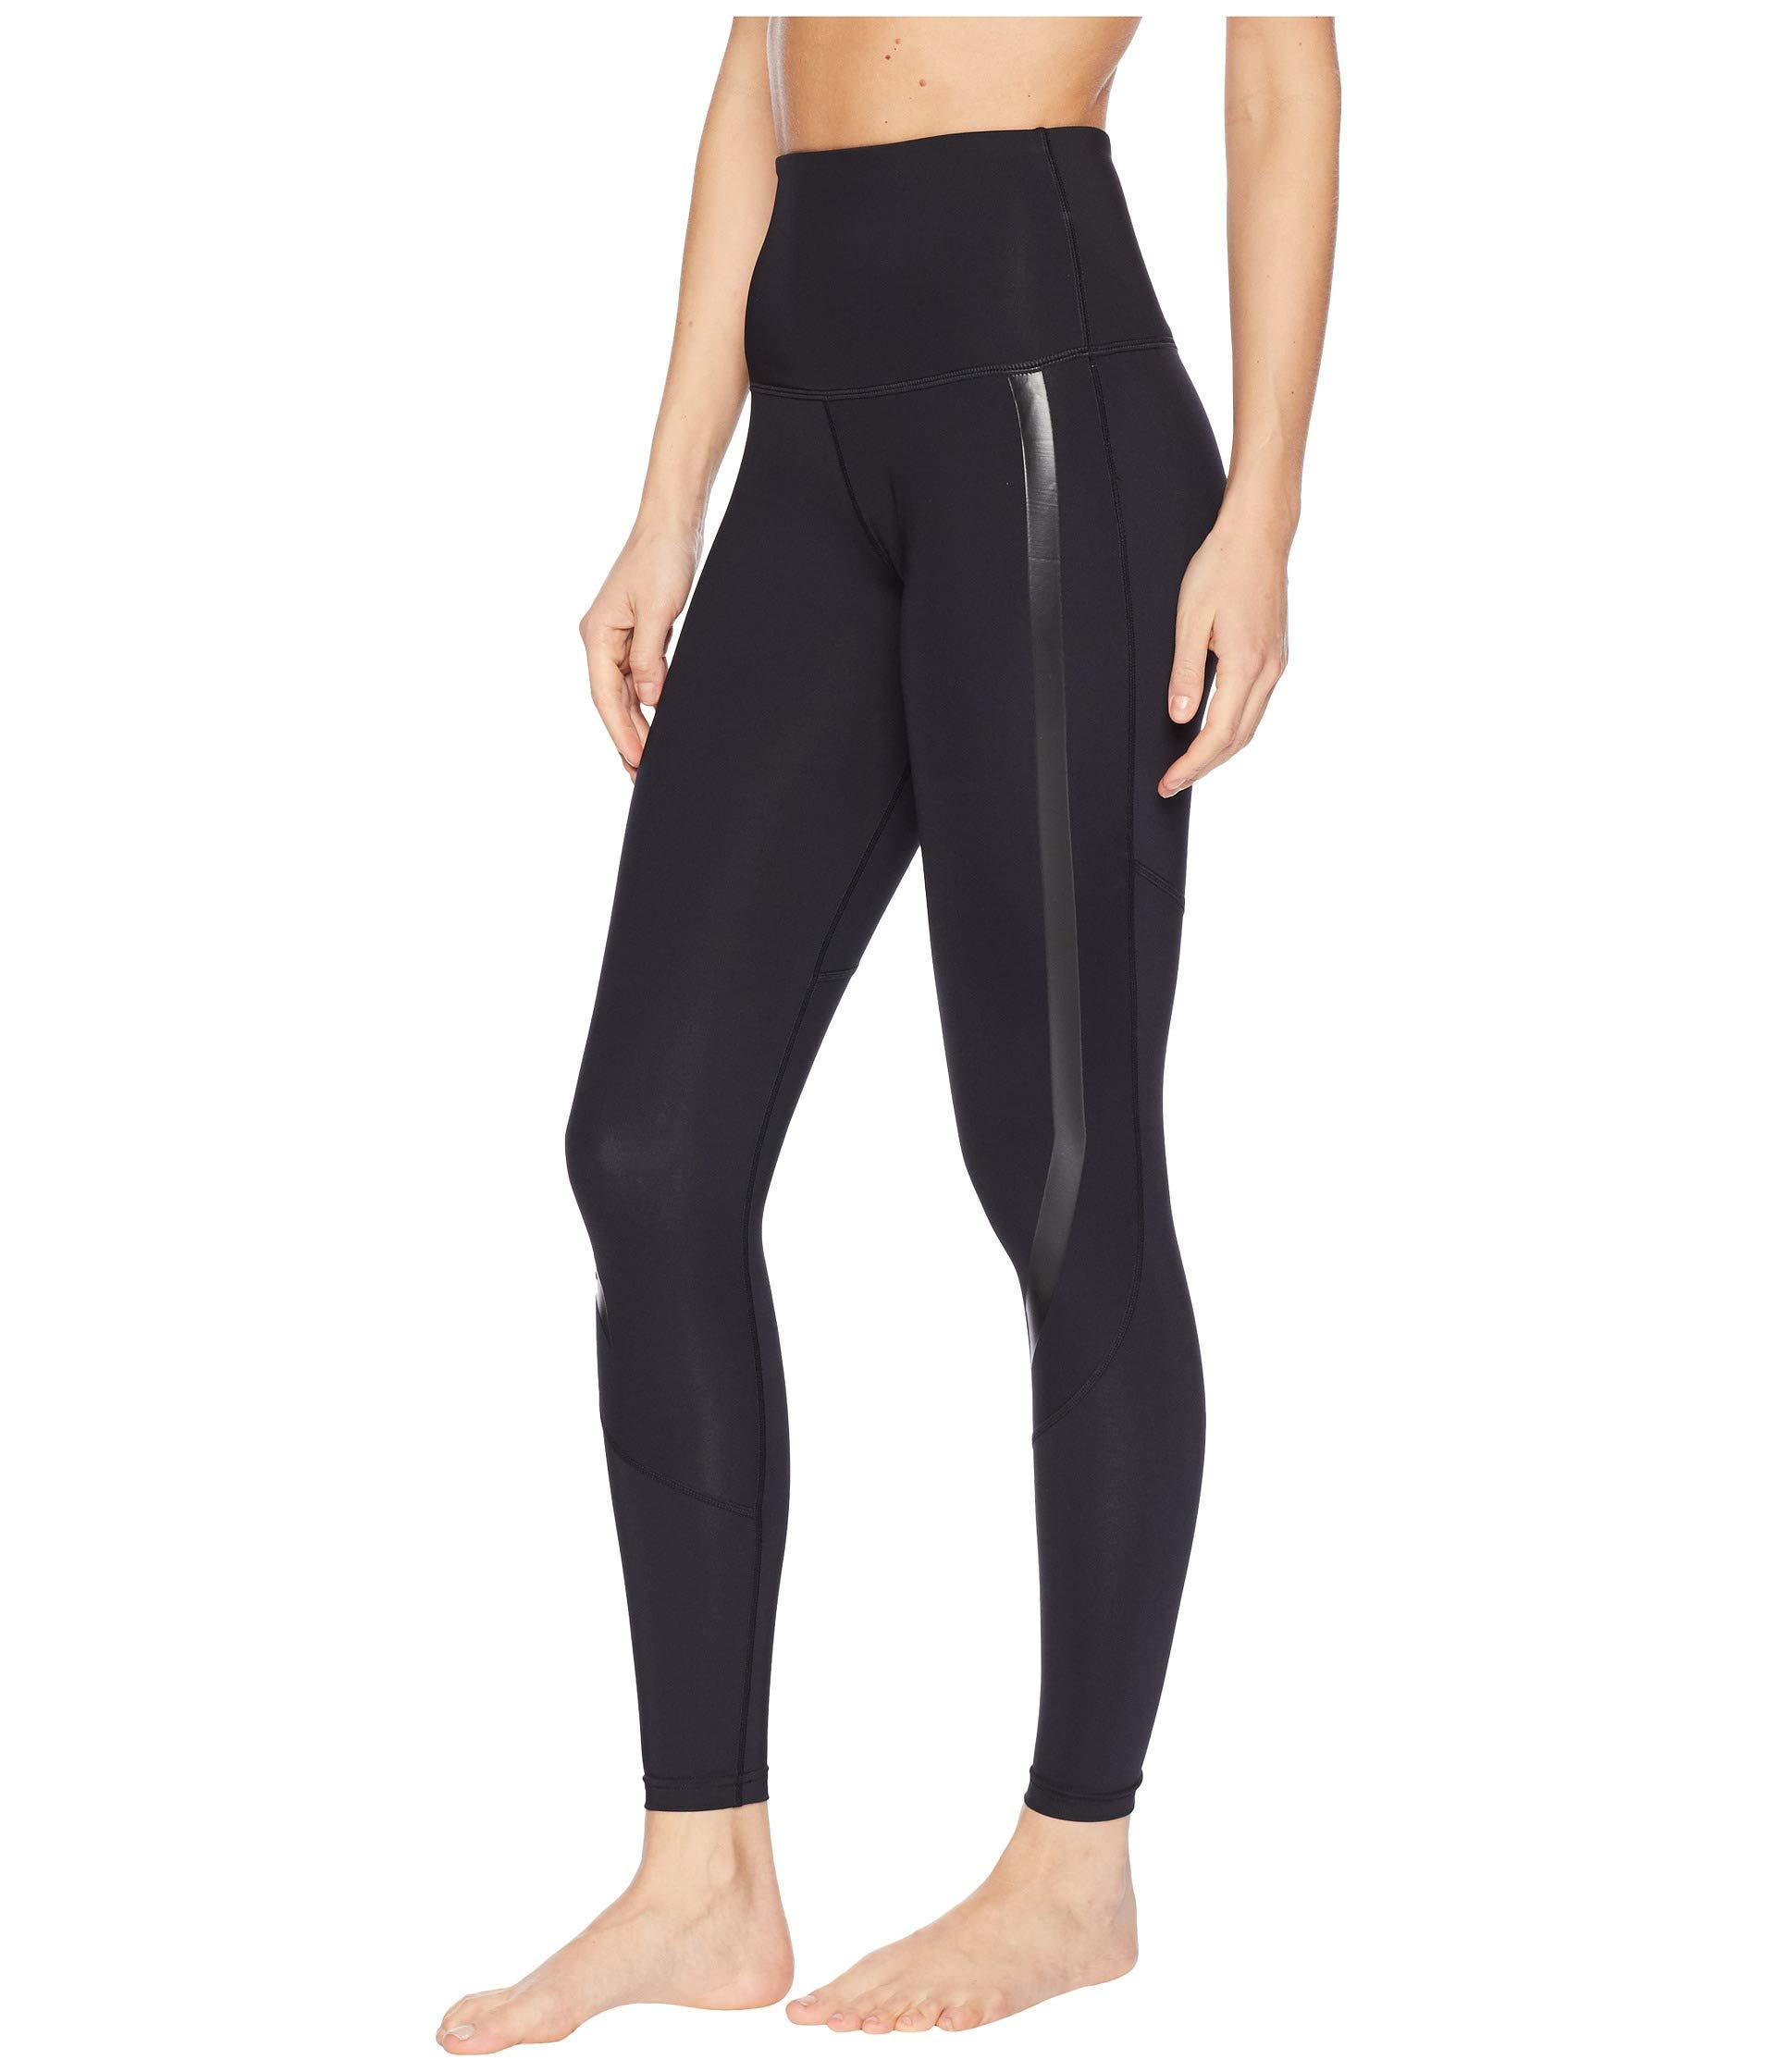 5706a89c21c6a Lyst - 2XU Hi-rise Compression Tights (black/nero) Women's Workout in Black